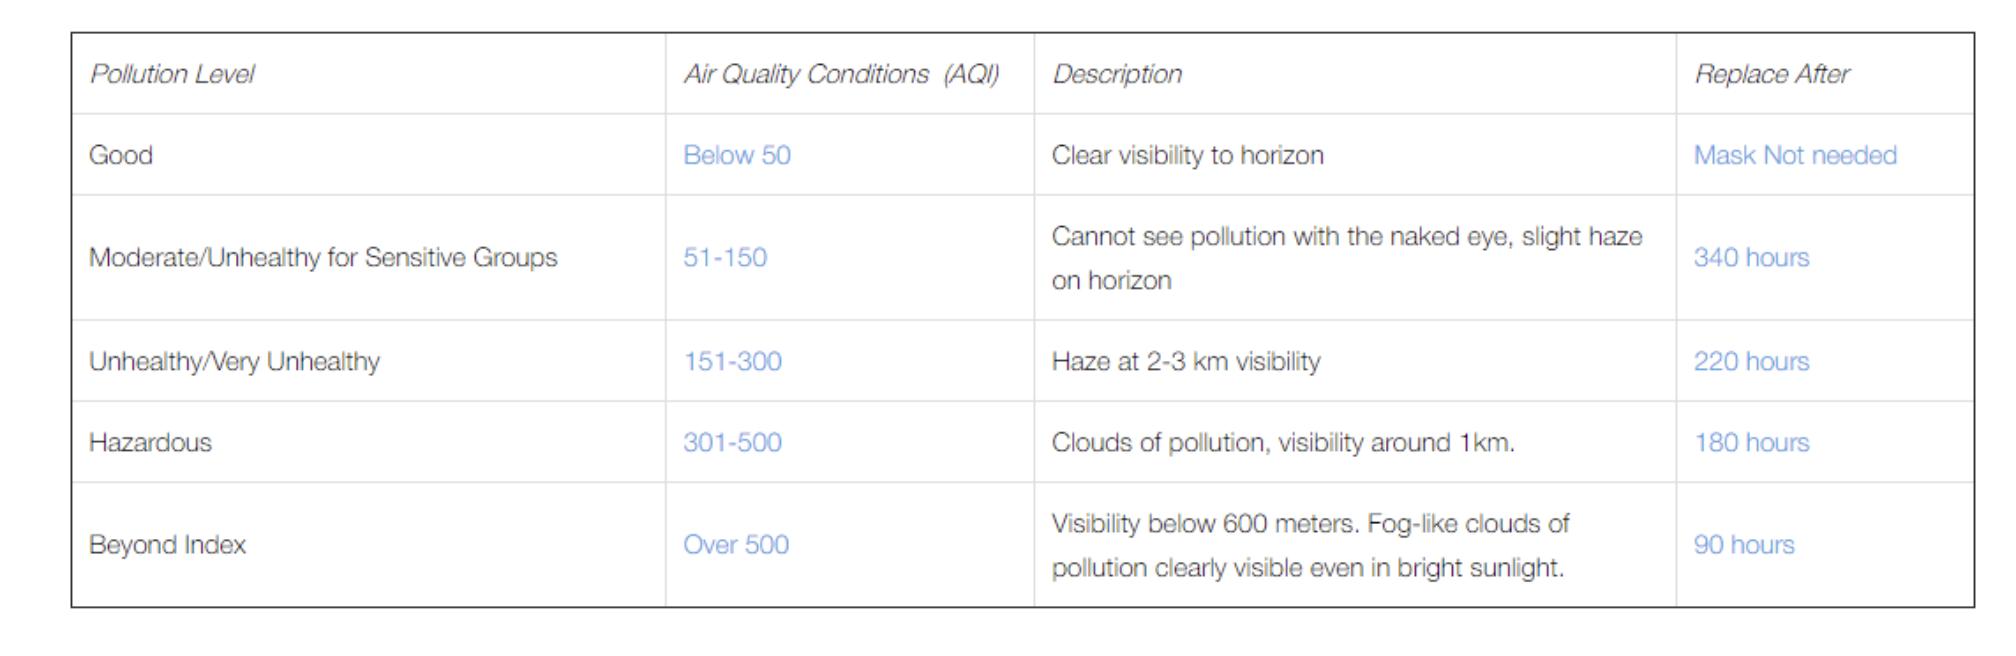 Cambridge Mask Pollution Level Table